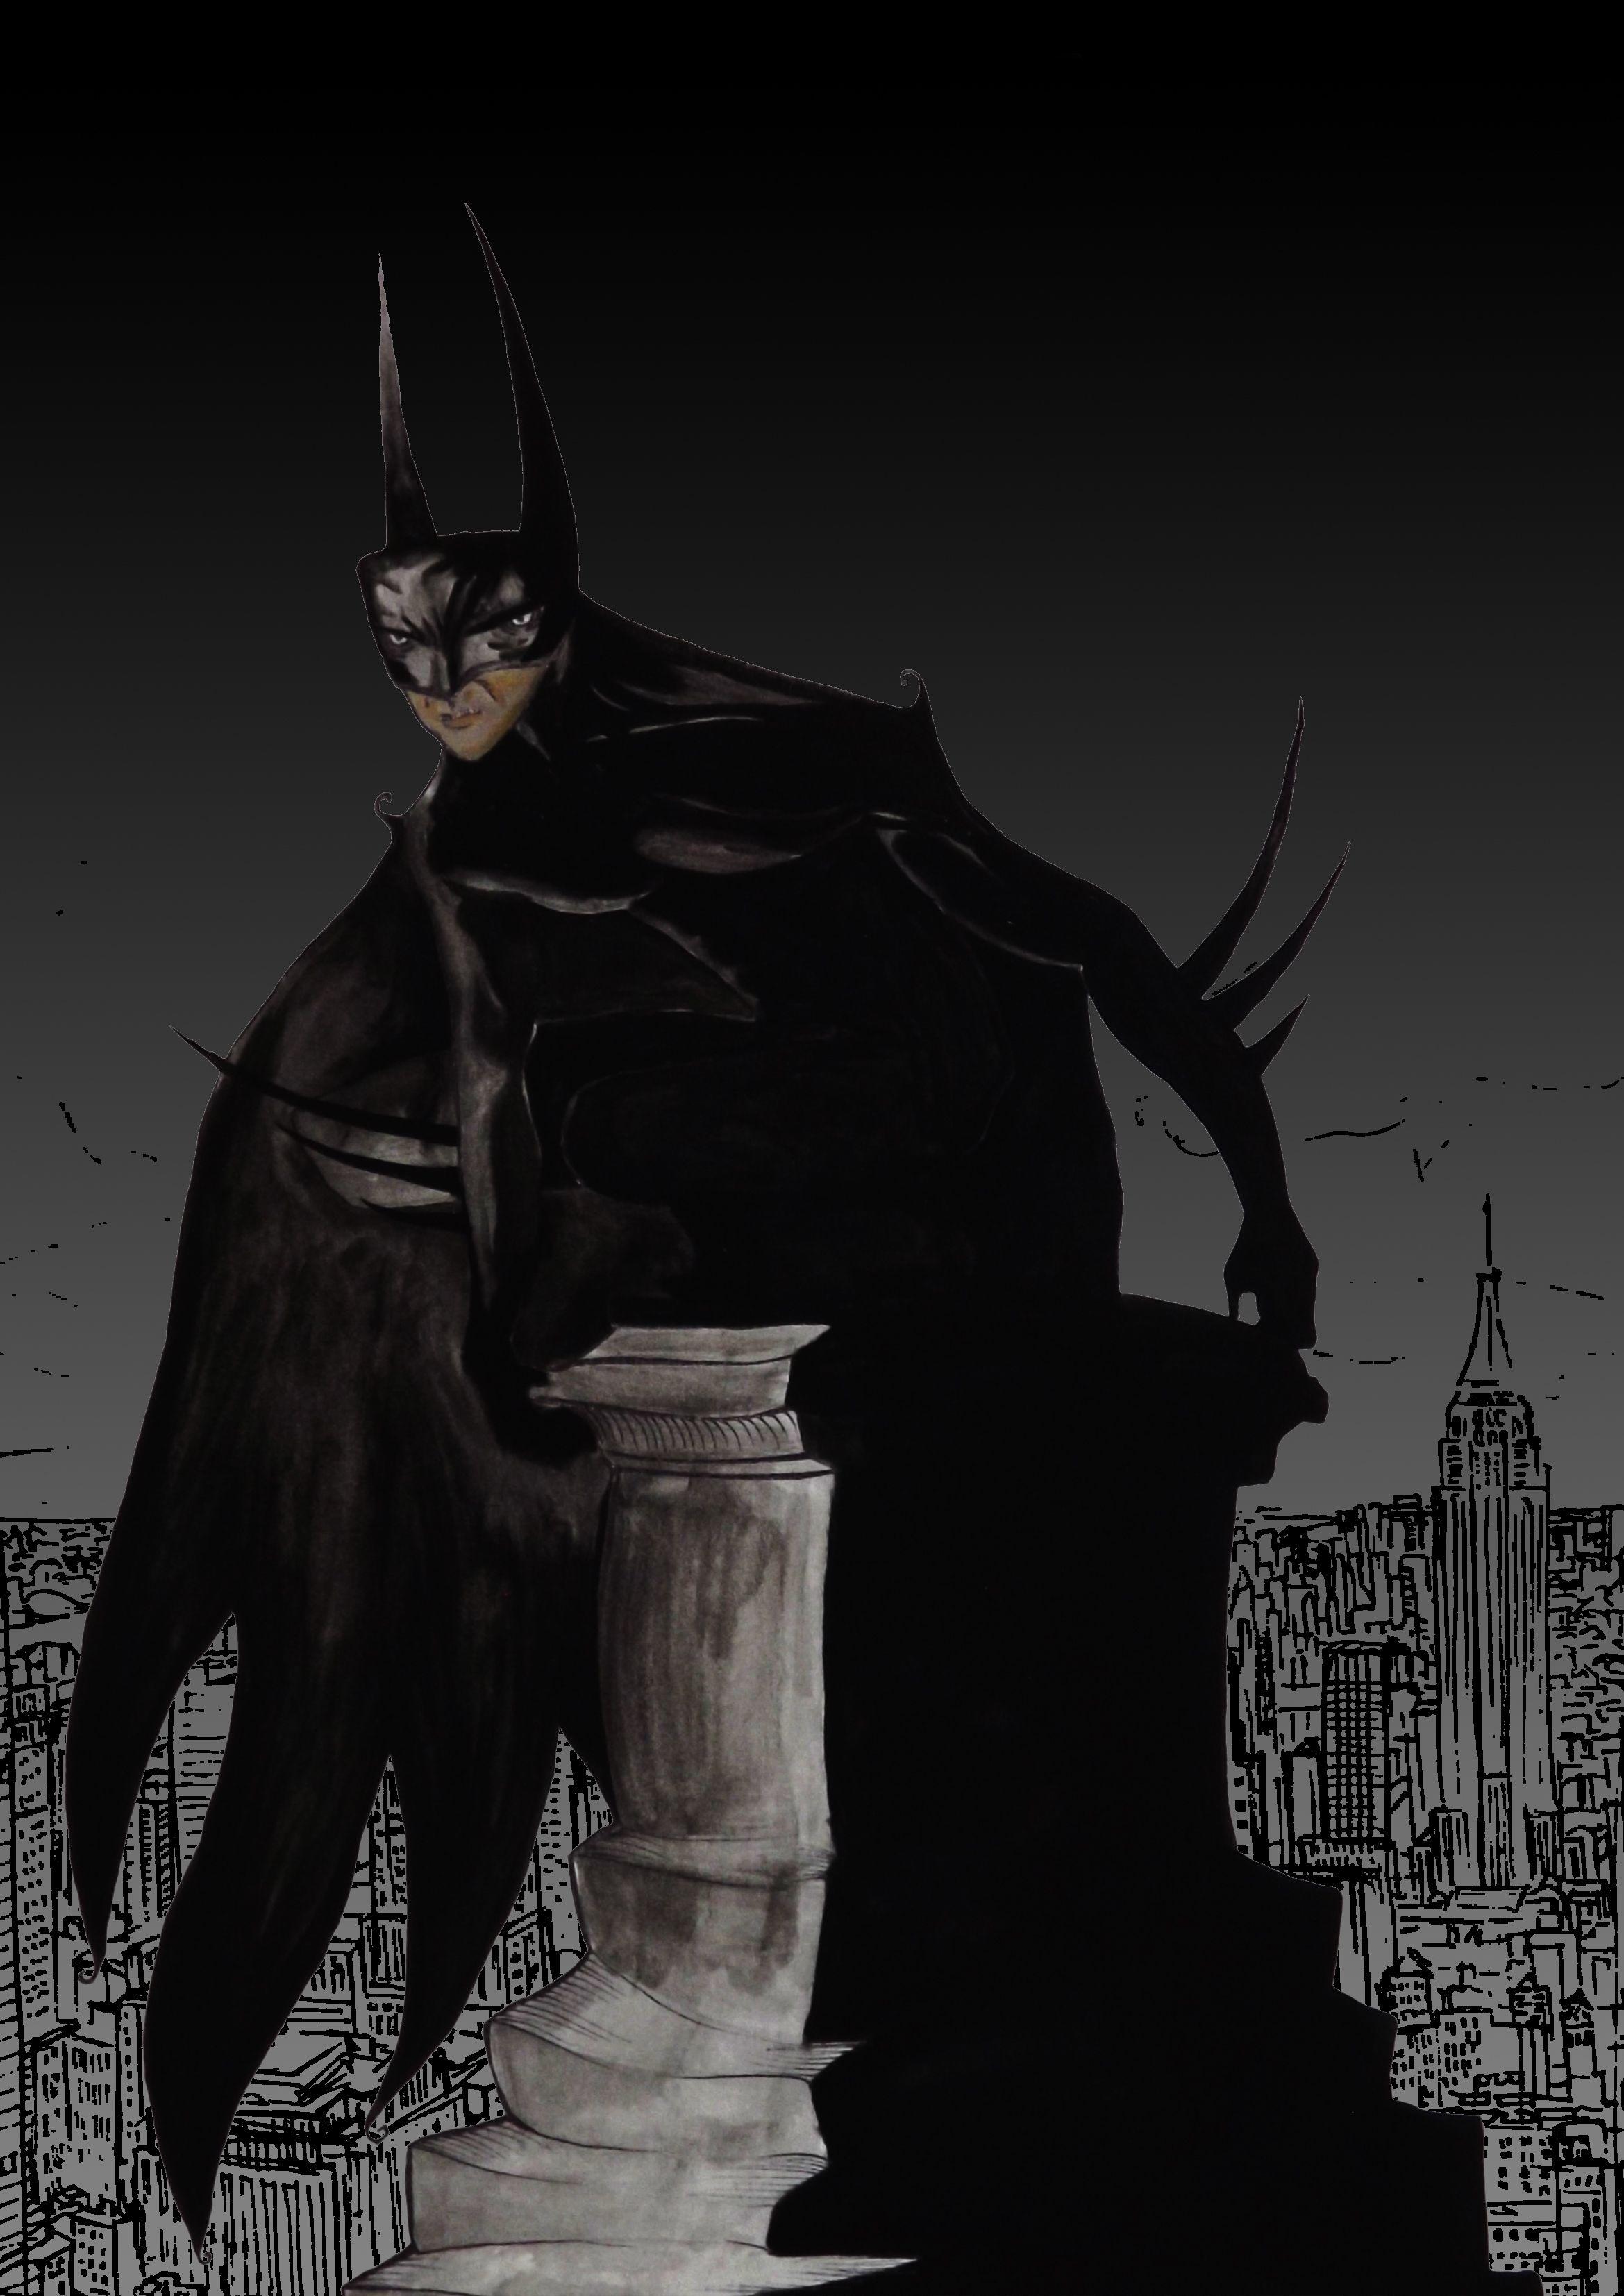 """Dark Detective"", 2014 - based on the character ""Batman"" created by Bob Kane. Print 5/5 $60"